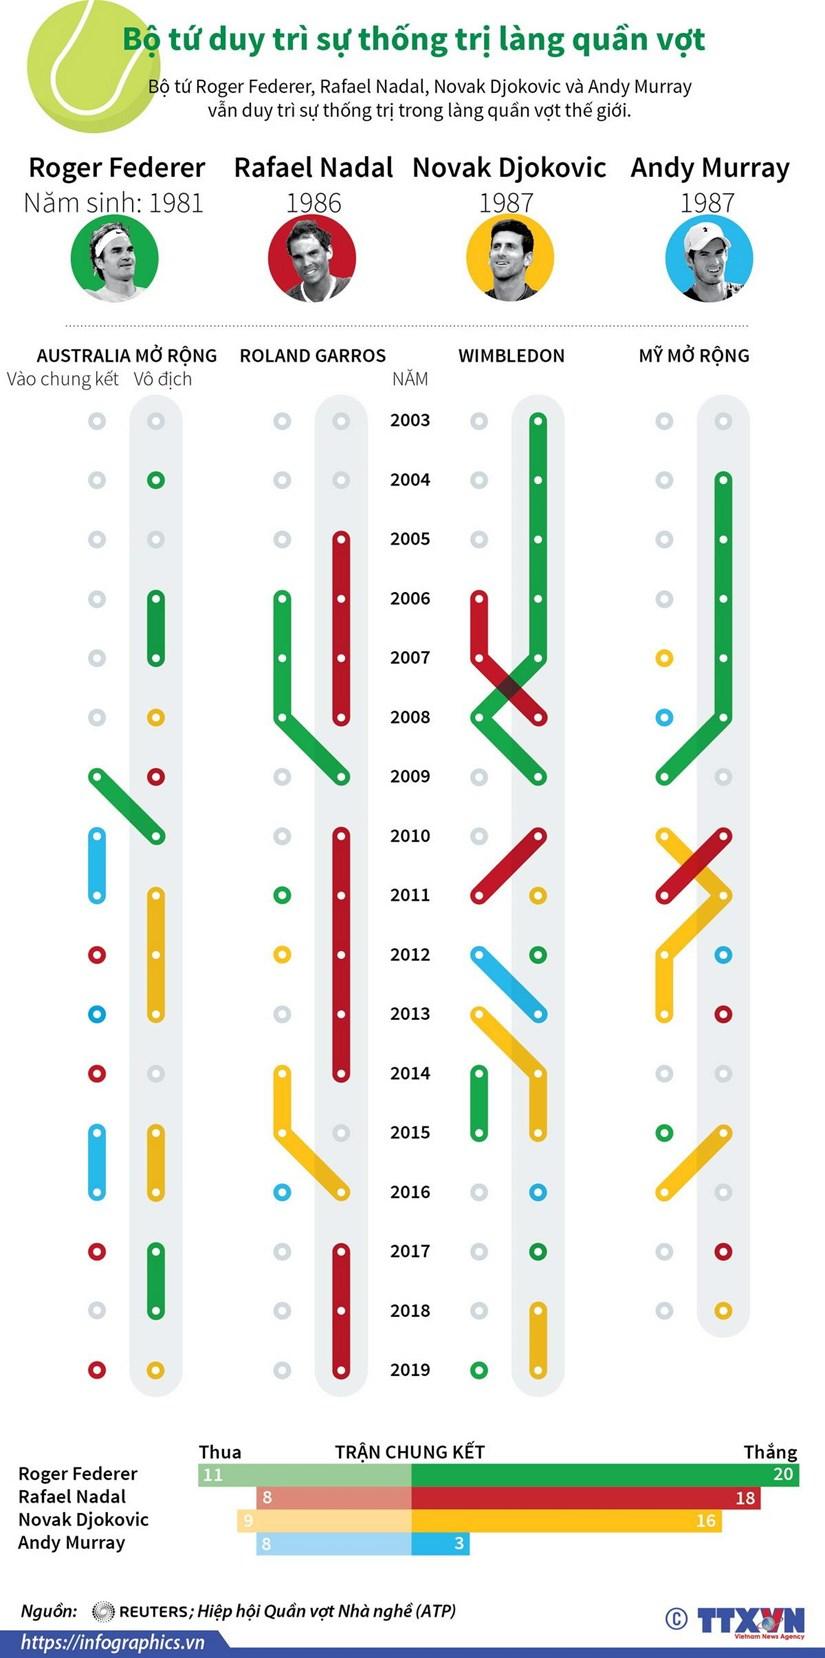 [Infographics] Bo tu duy tri su thong tri lang quan vot hinh anh 1